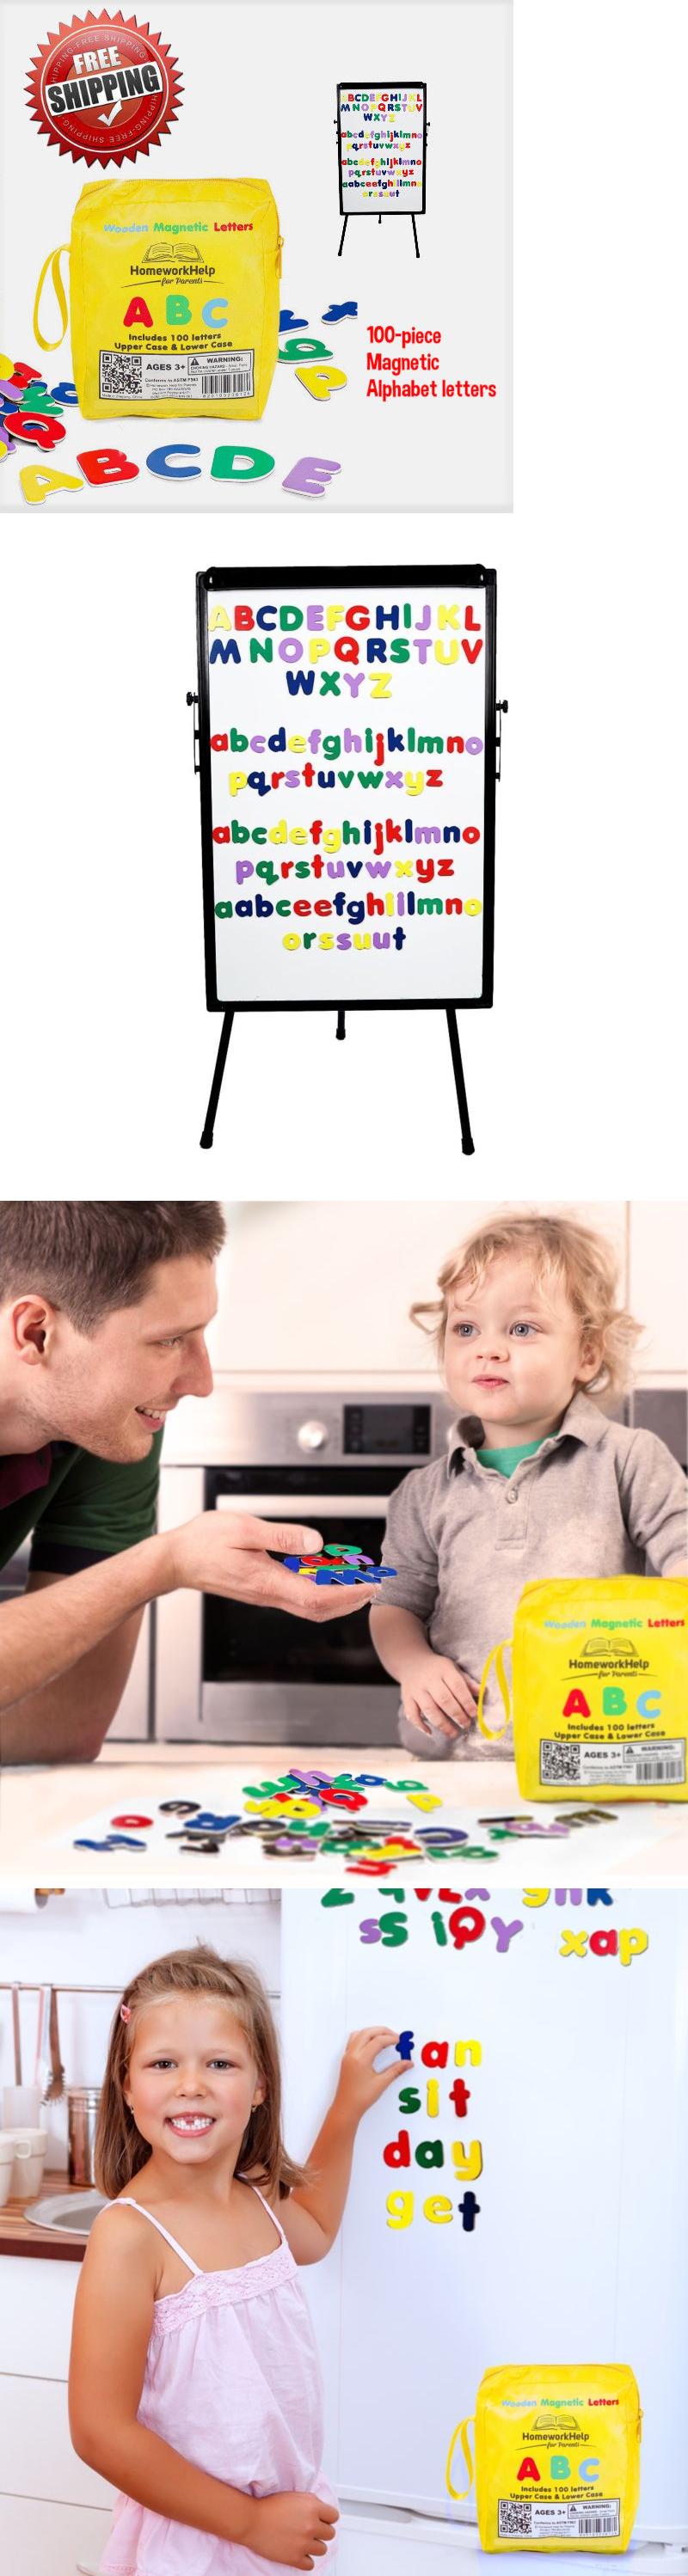 Preschool and Kindergarten Children Learning Toys 100 Pcs